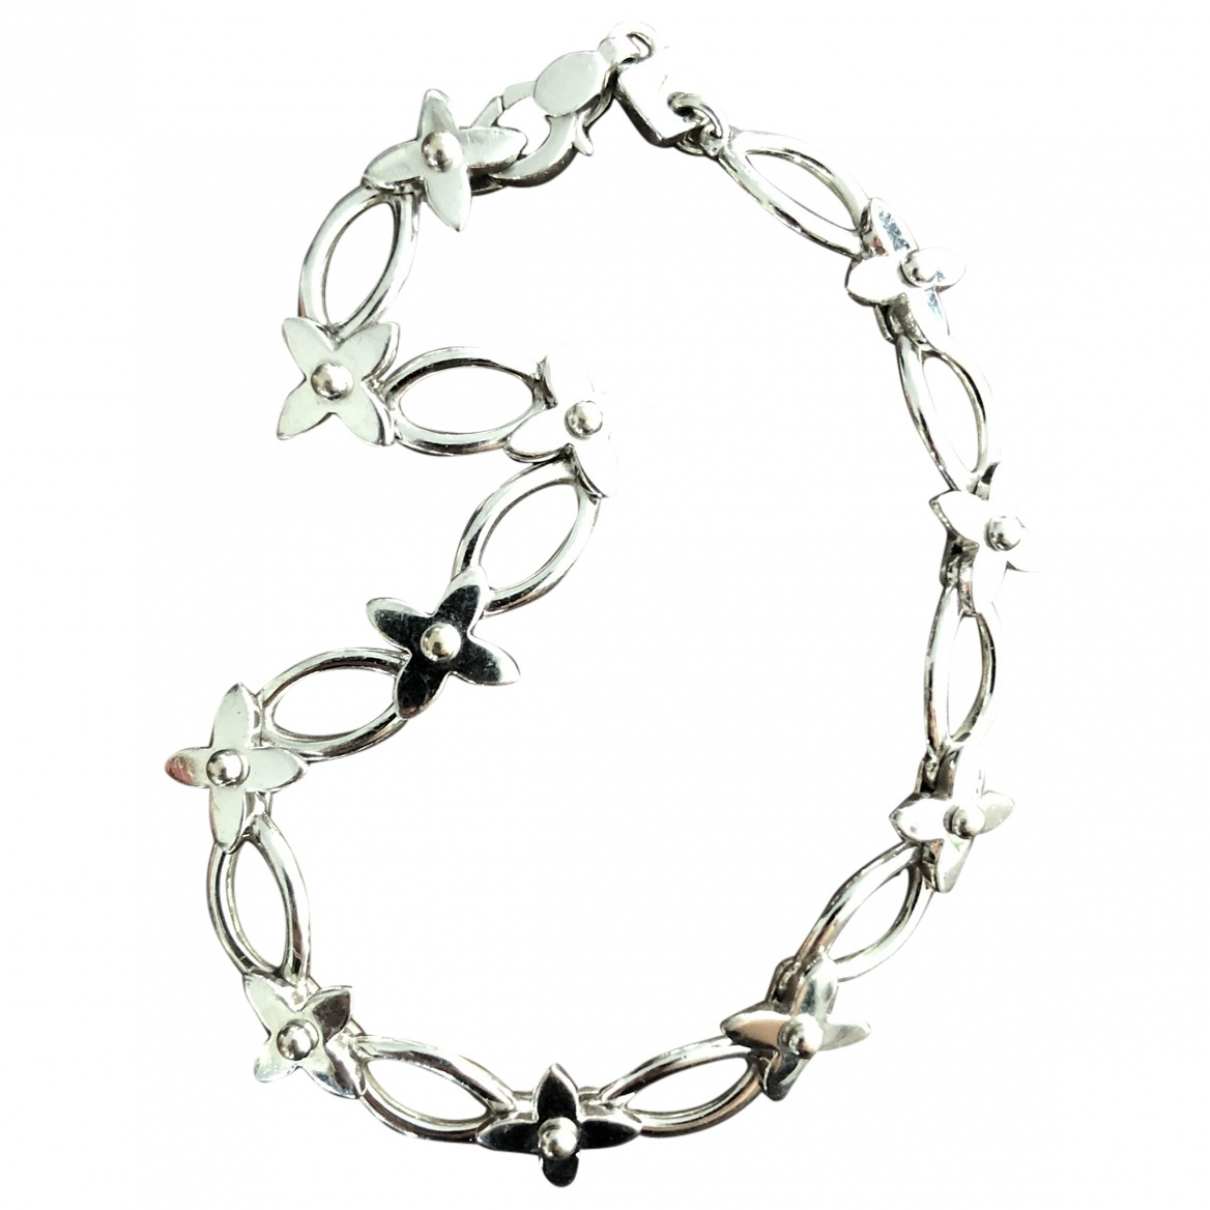 Louis Vuitton Idylle Blossom Armband in  Grau Weissgold